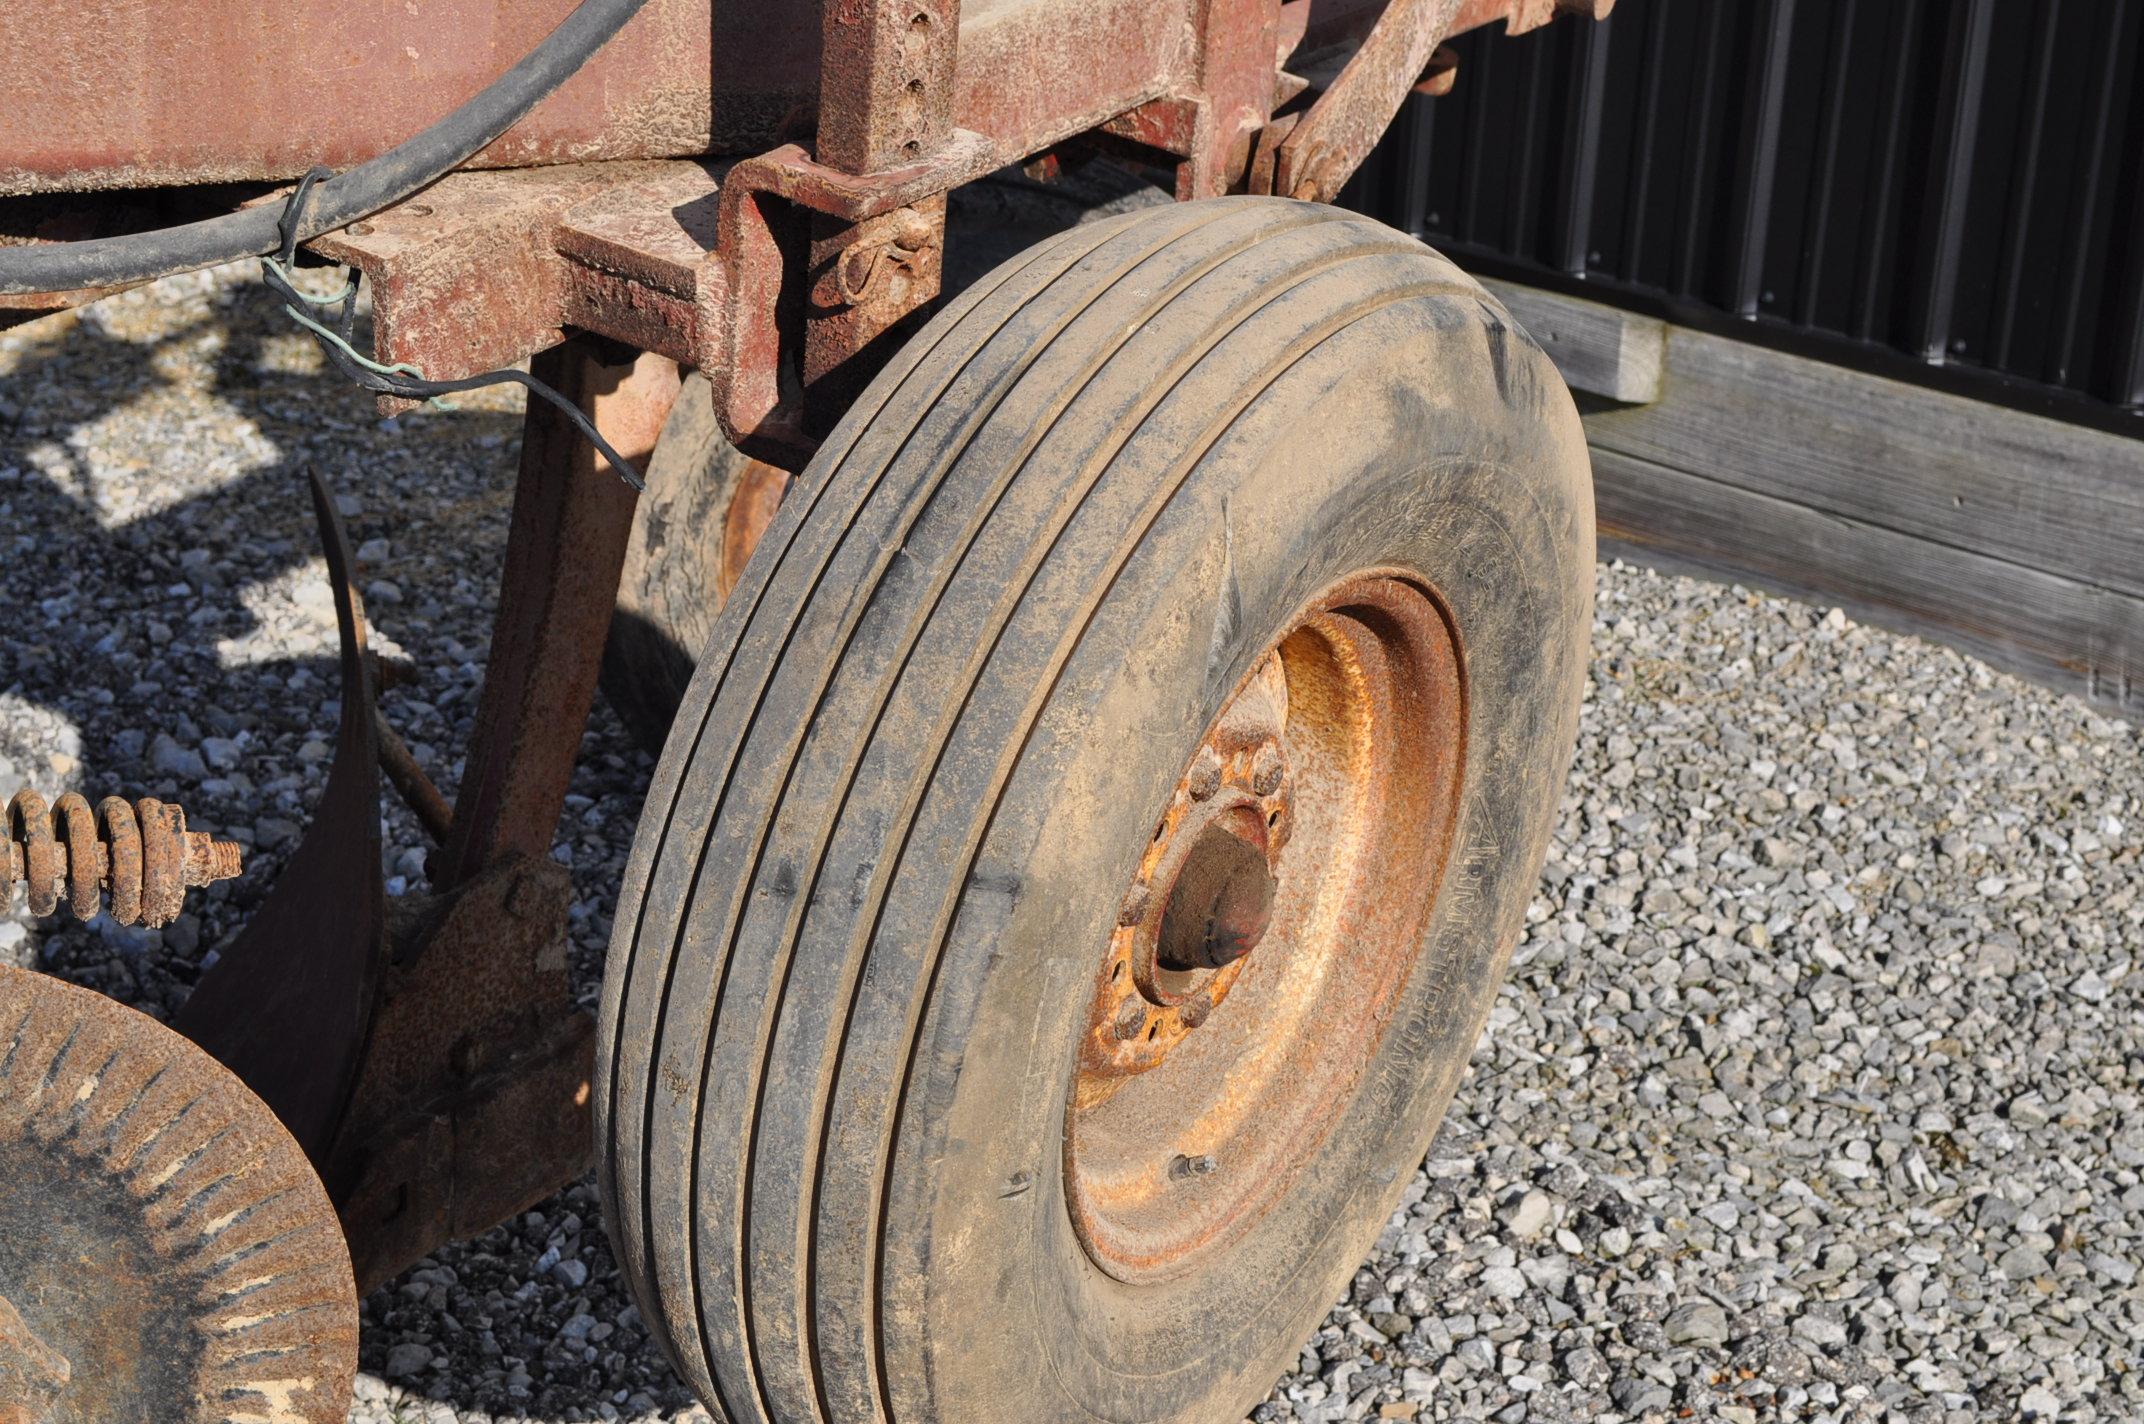 International 700 onland moldboard plow, 7 btm, auto reset trip - Image 6 of 16